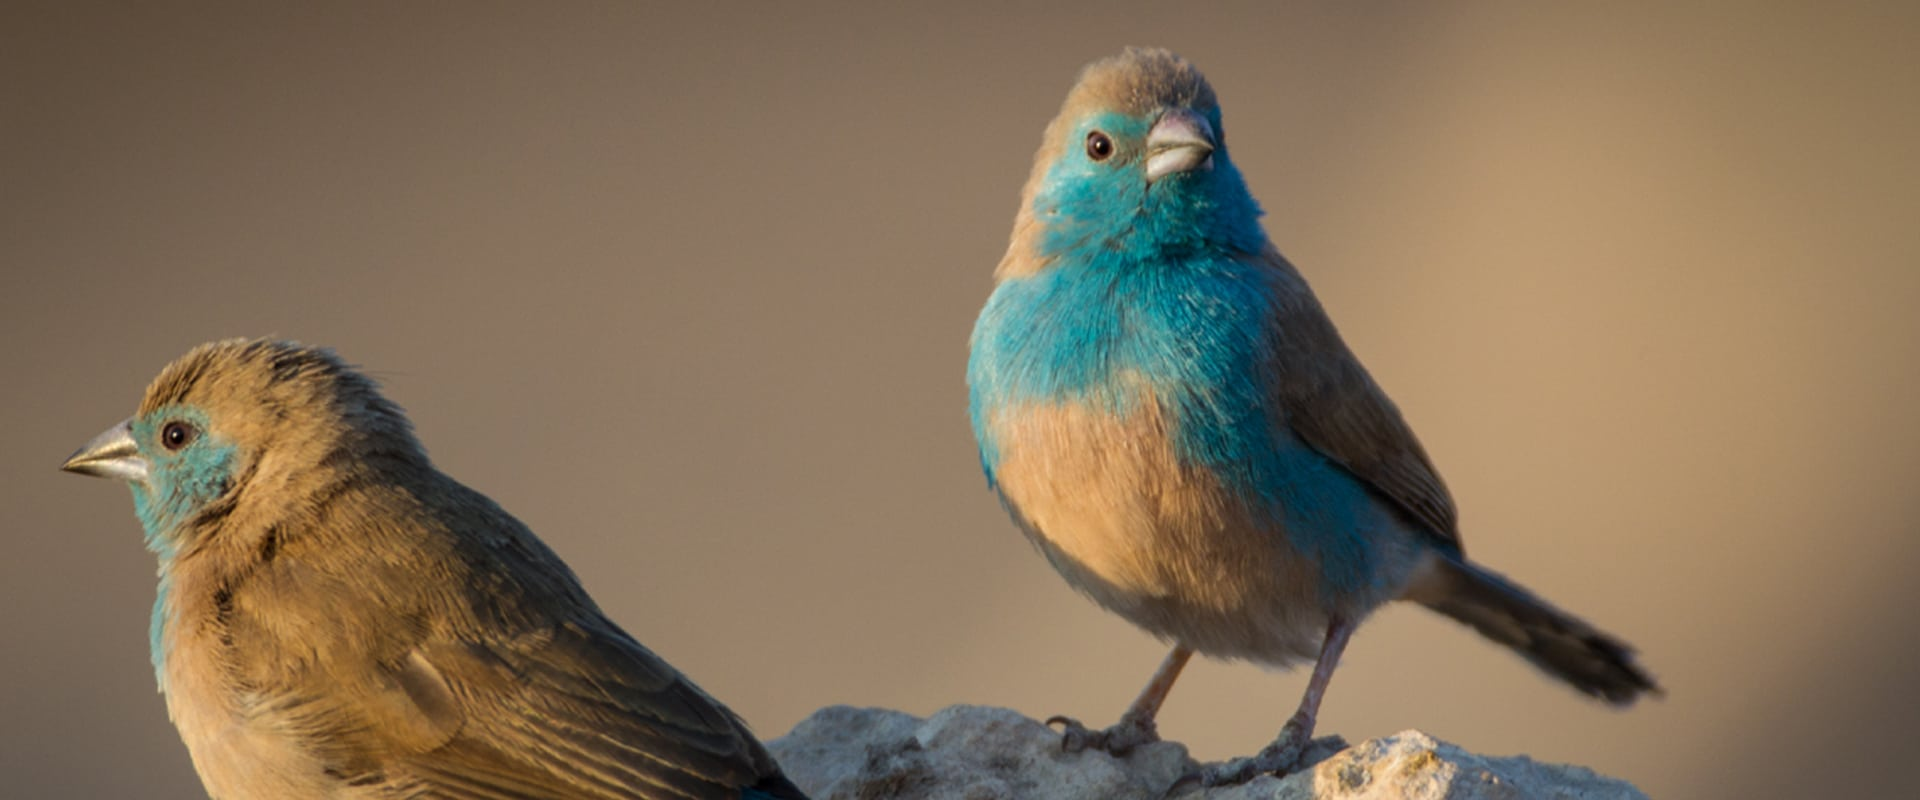 Bird watching at the wetlands